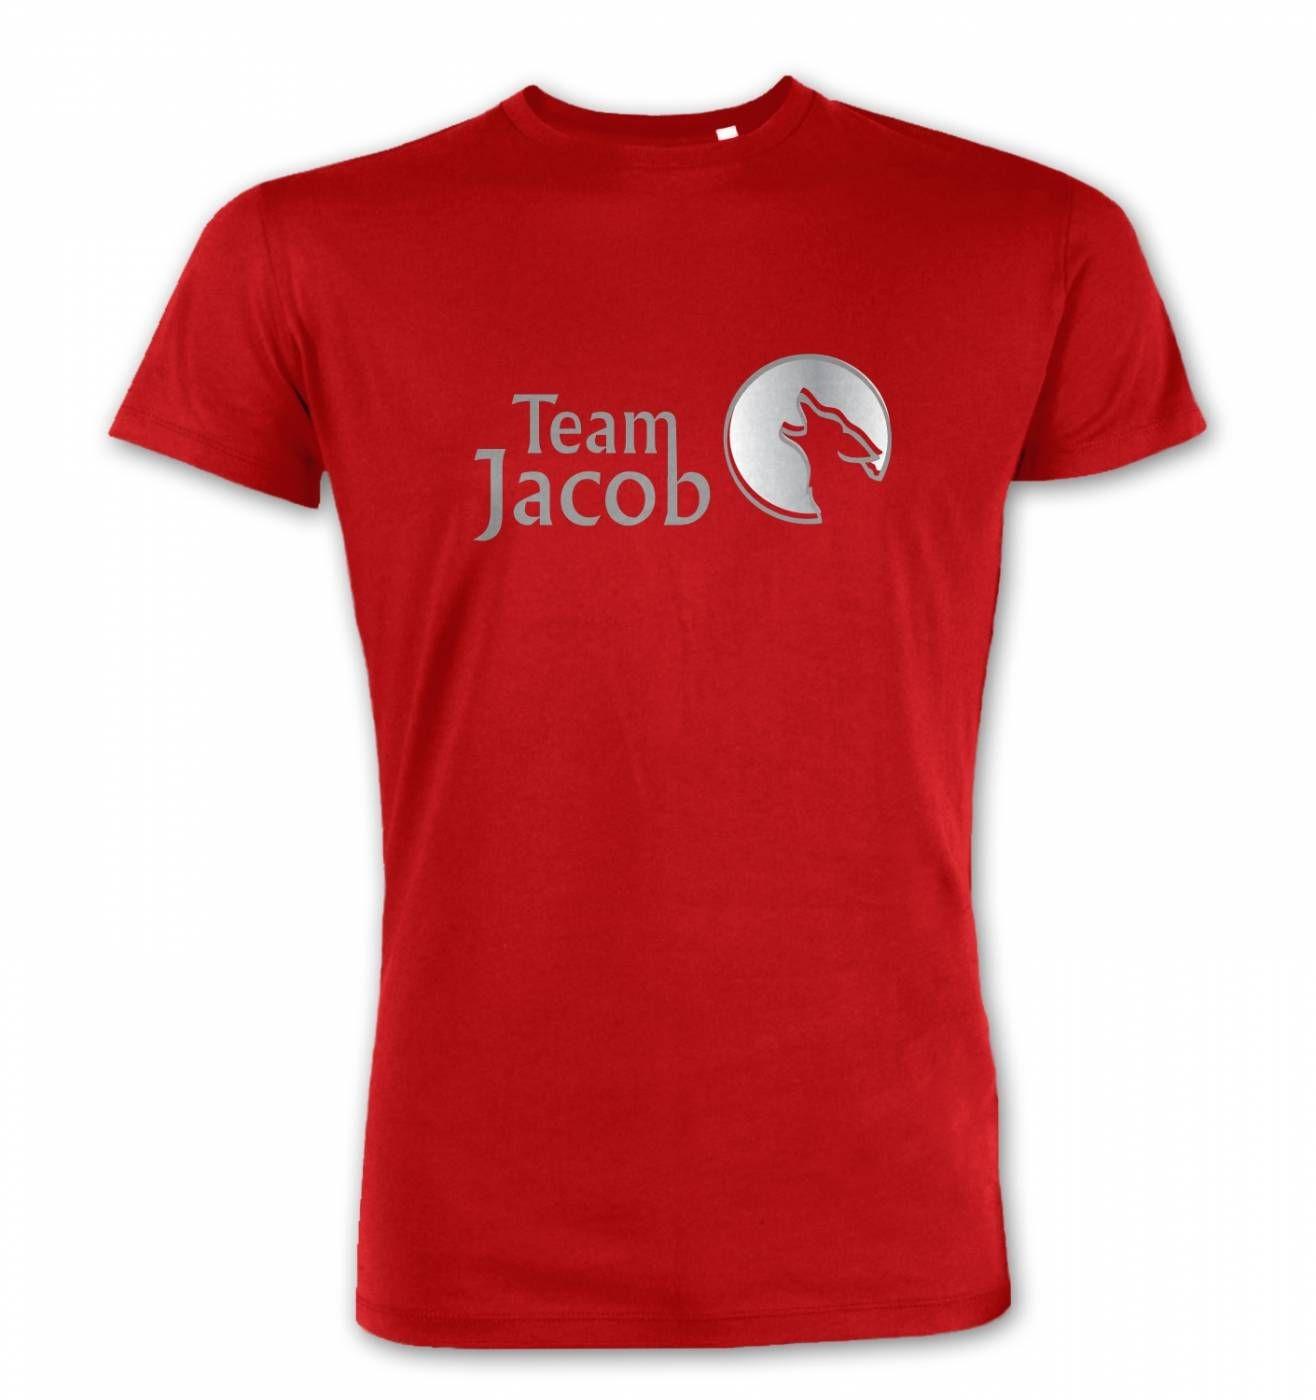 Team Jacob Premium t-shirt - Inspired by Twilight